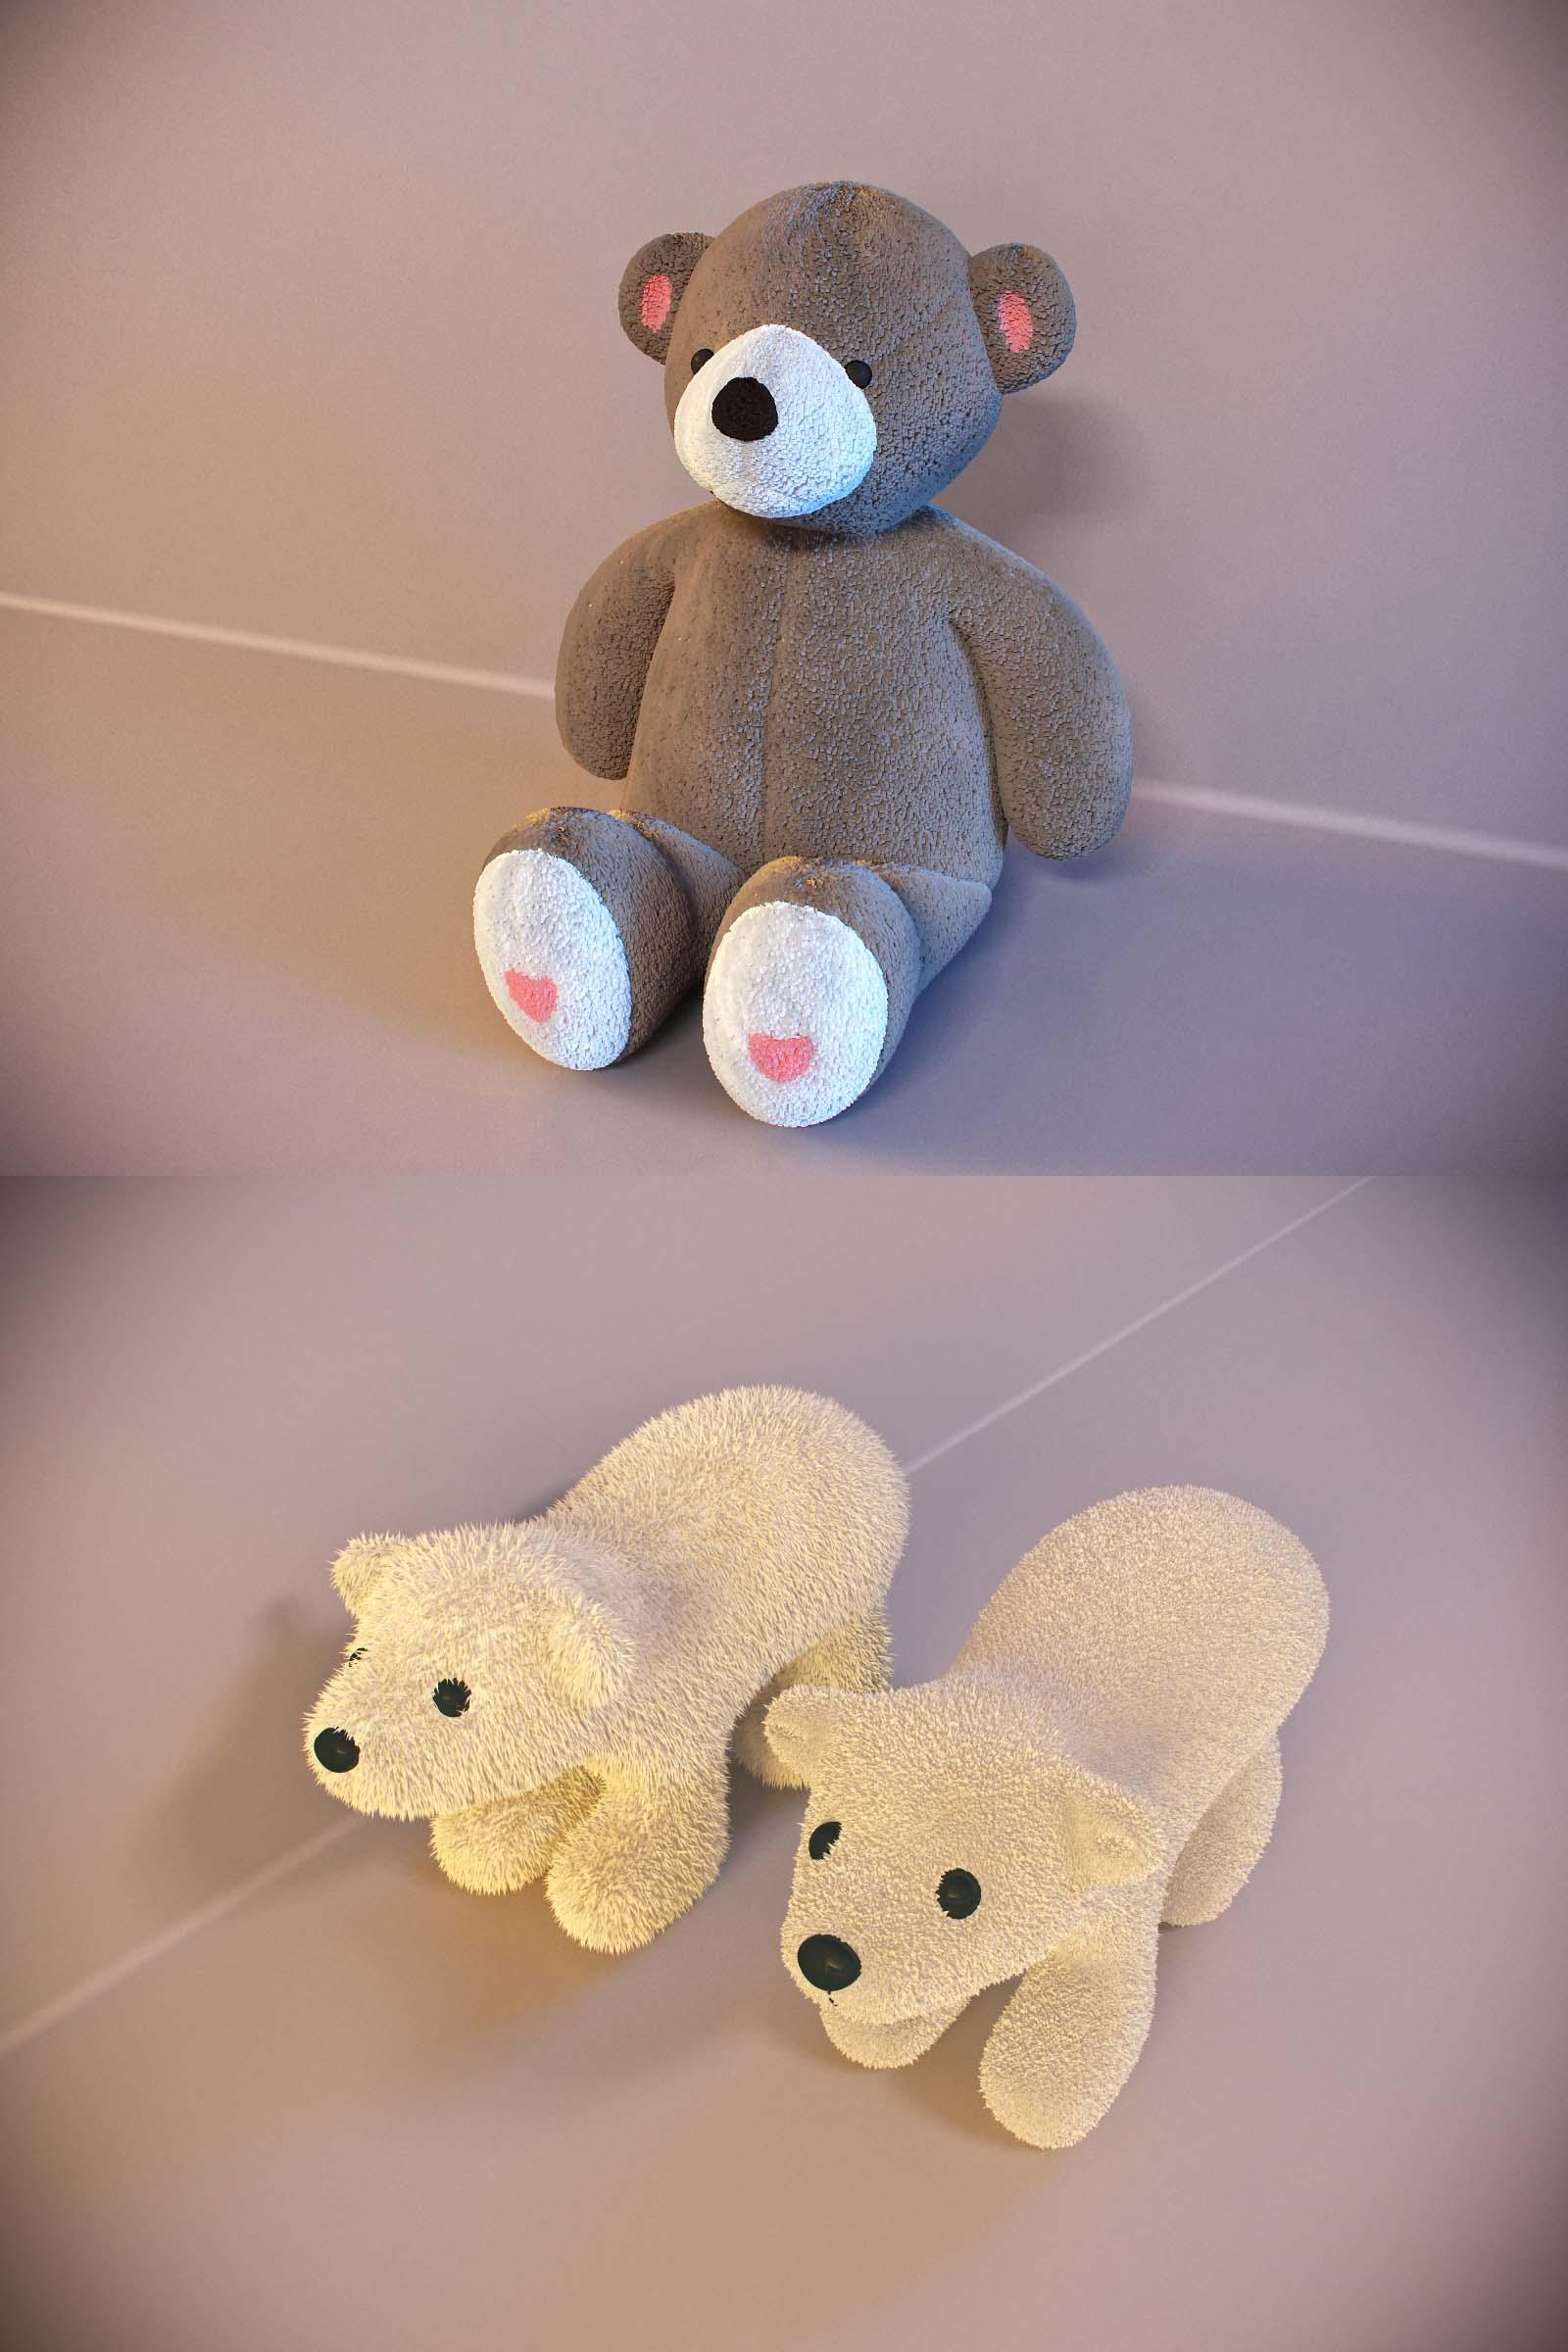 3D models of bears